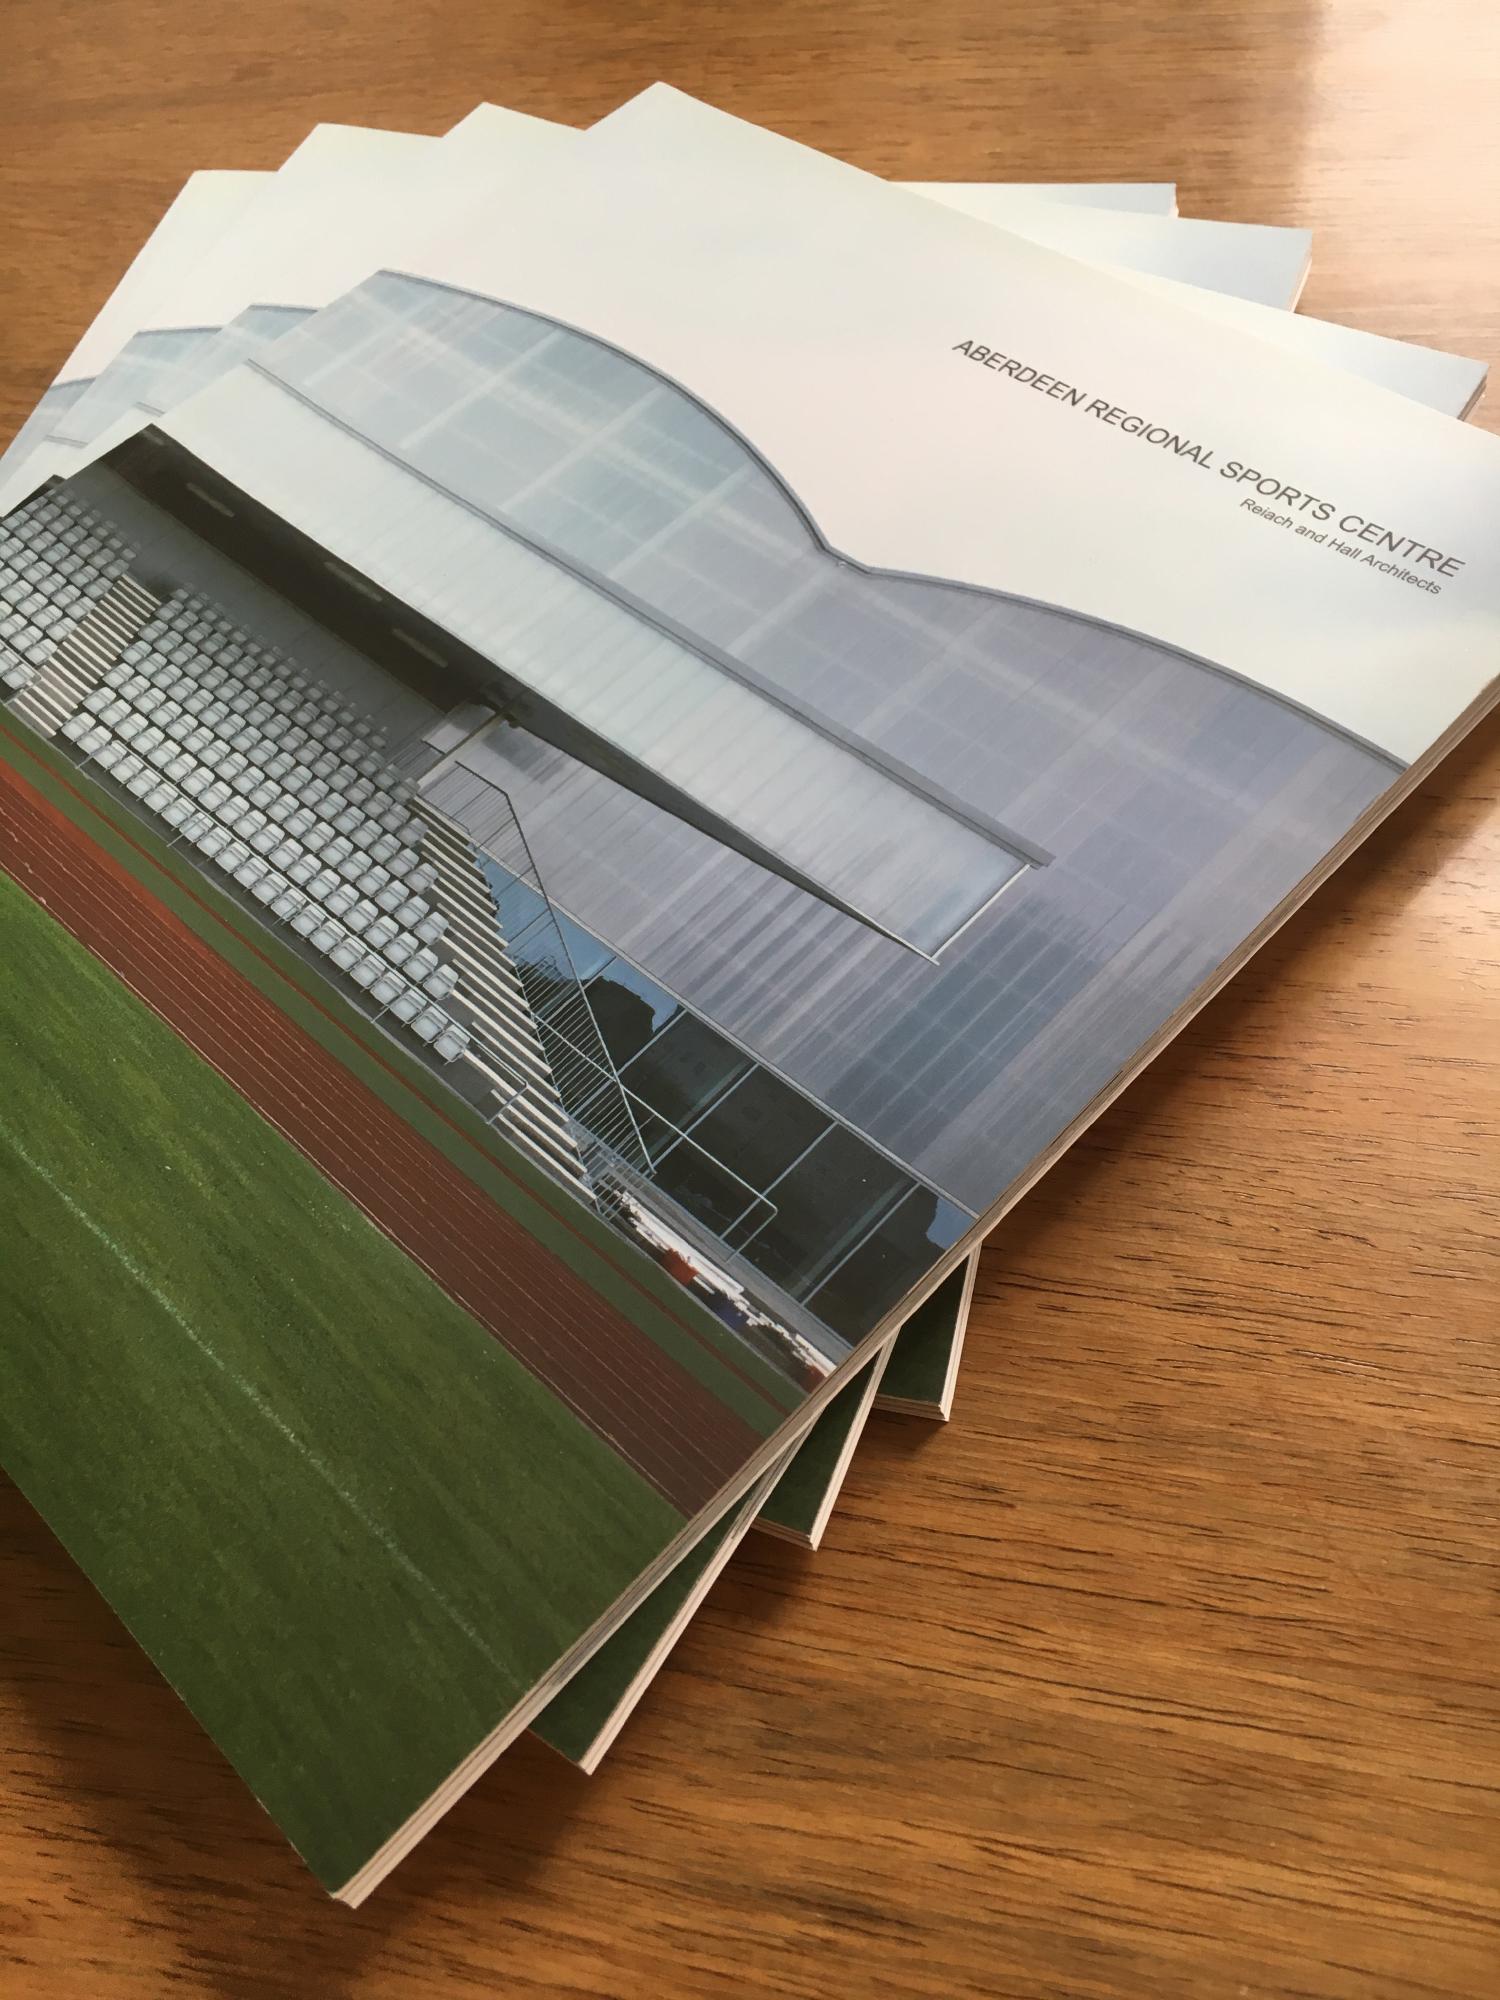 Aberdeen Regional Sports Centre